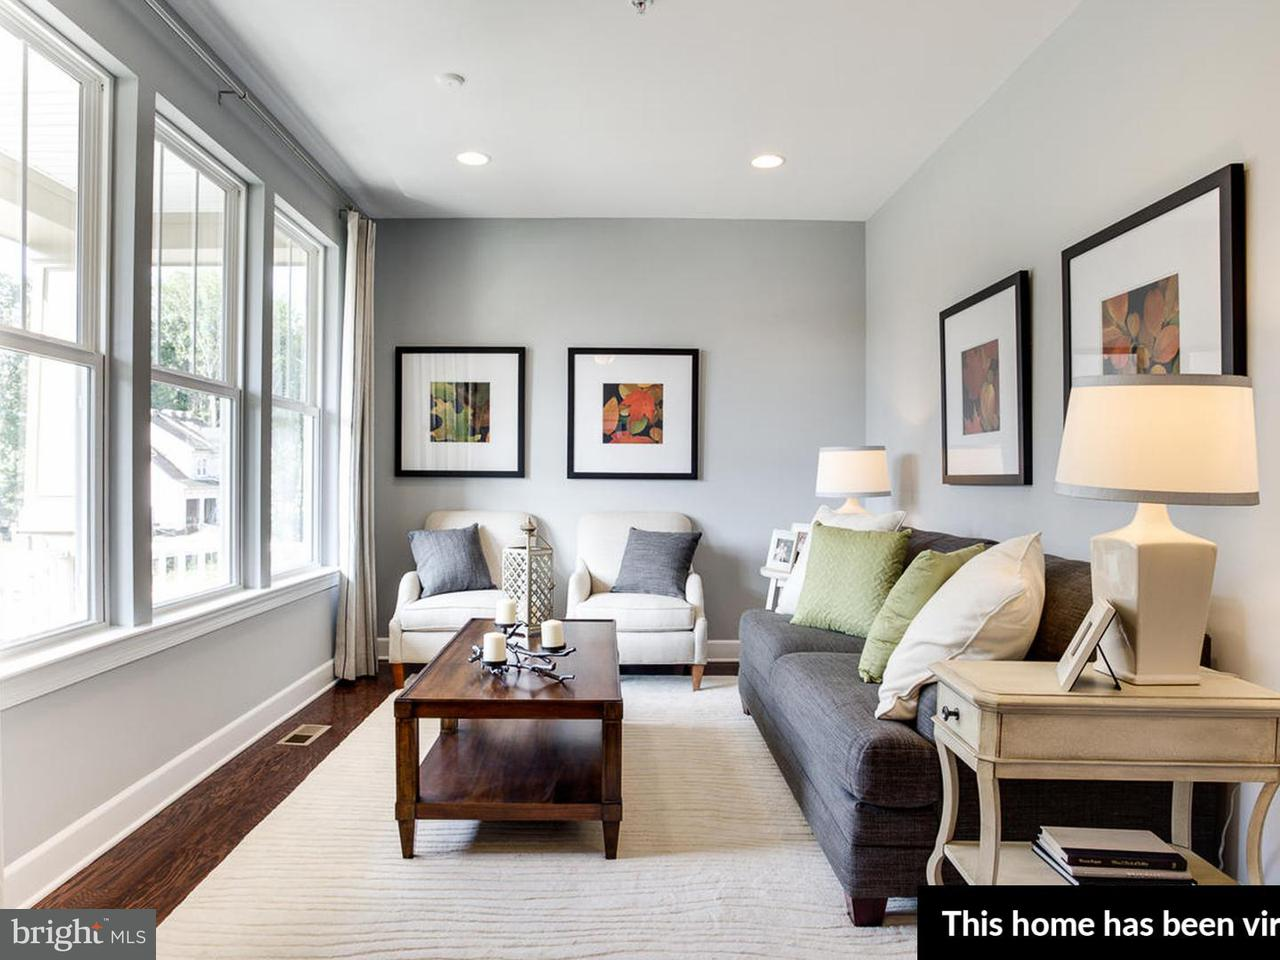 Single Family Home for Sale at 23452 LILLIFLORA Drive 23452 LILLIFLORA Drive California, Maryland 20619 United States